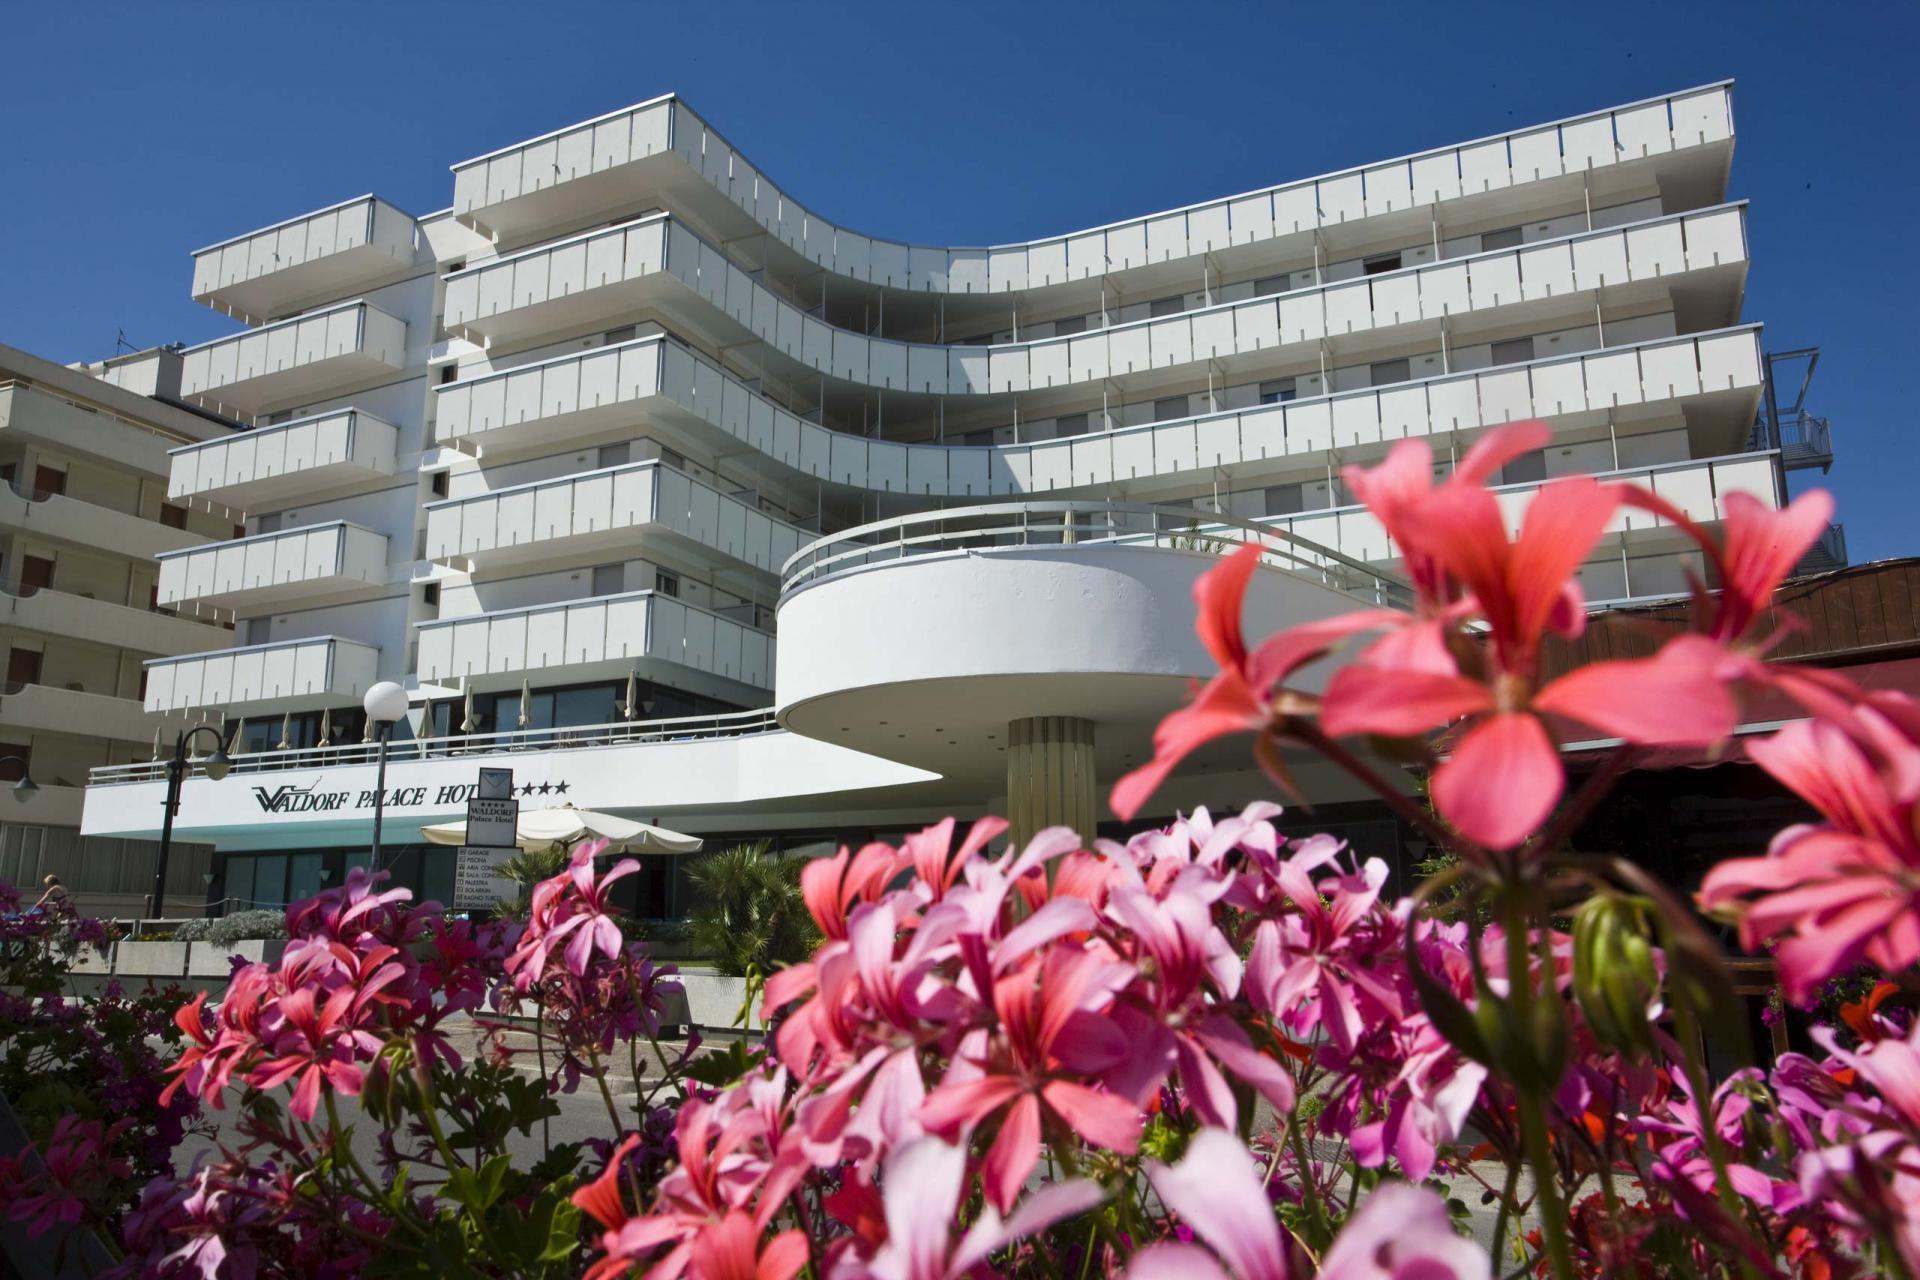 Cattolica - Hotel Waldorf Palace